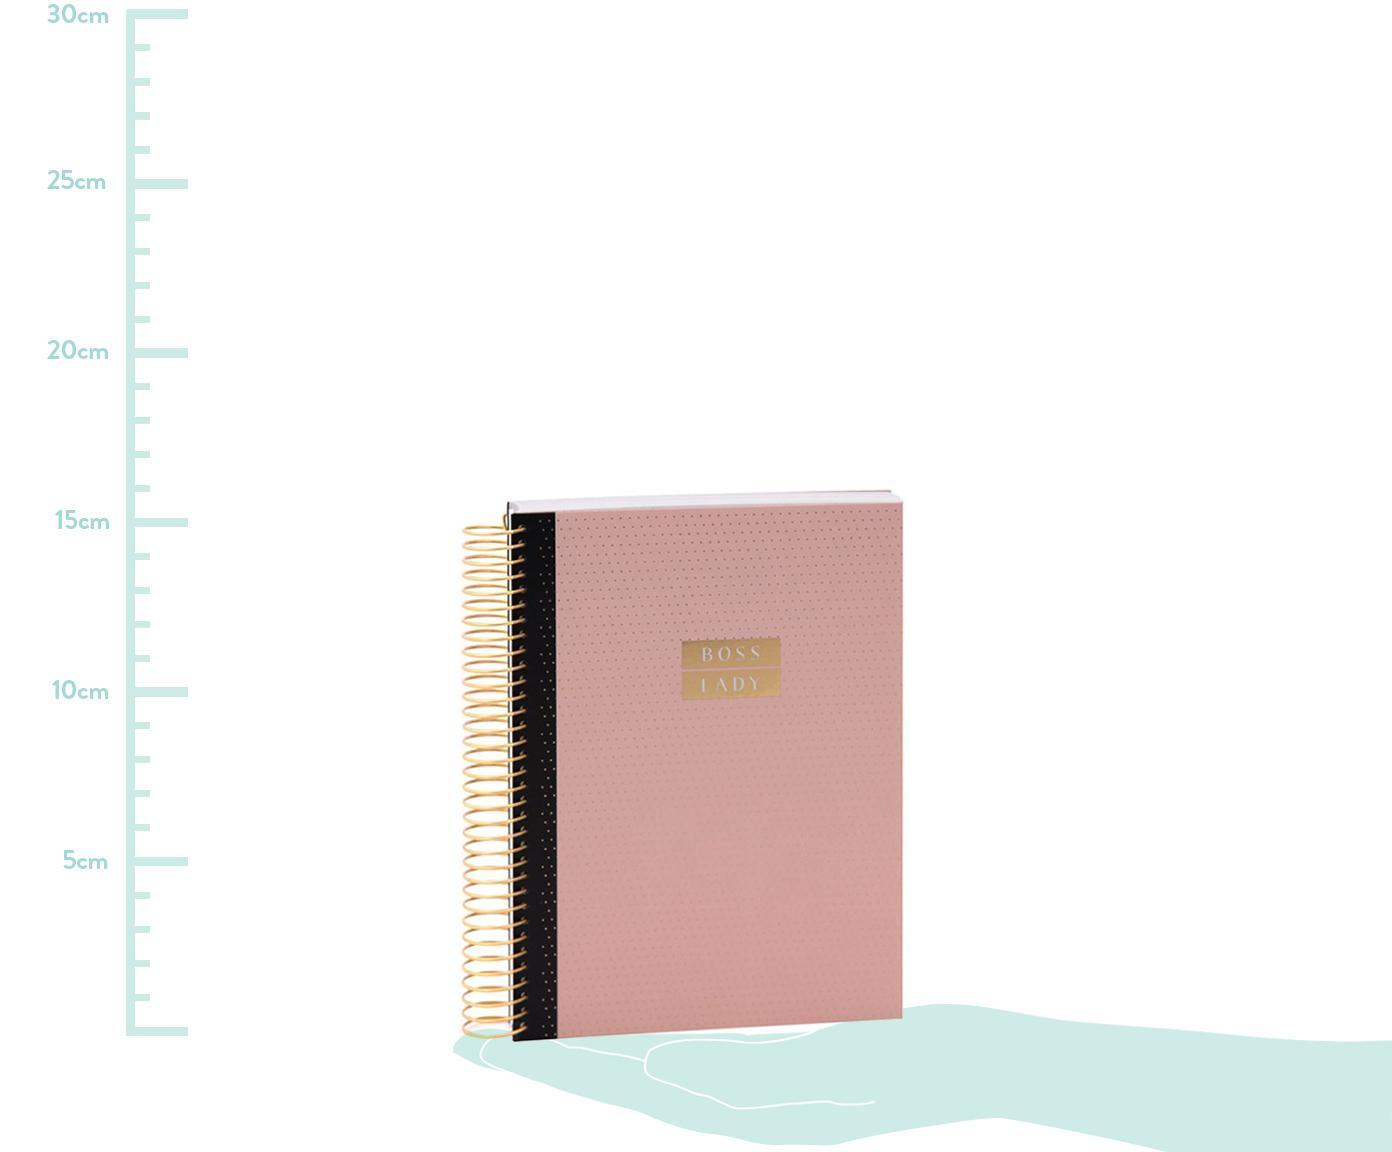 Notizbuch Boss Lady, Rosa, Goldfraben, 21 x 15 cm